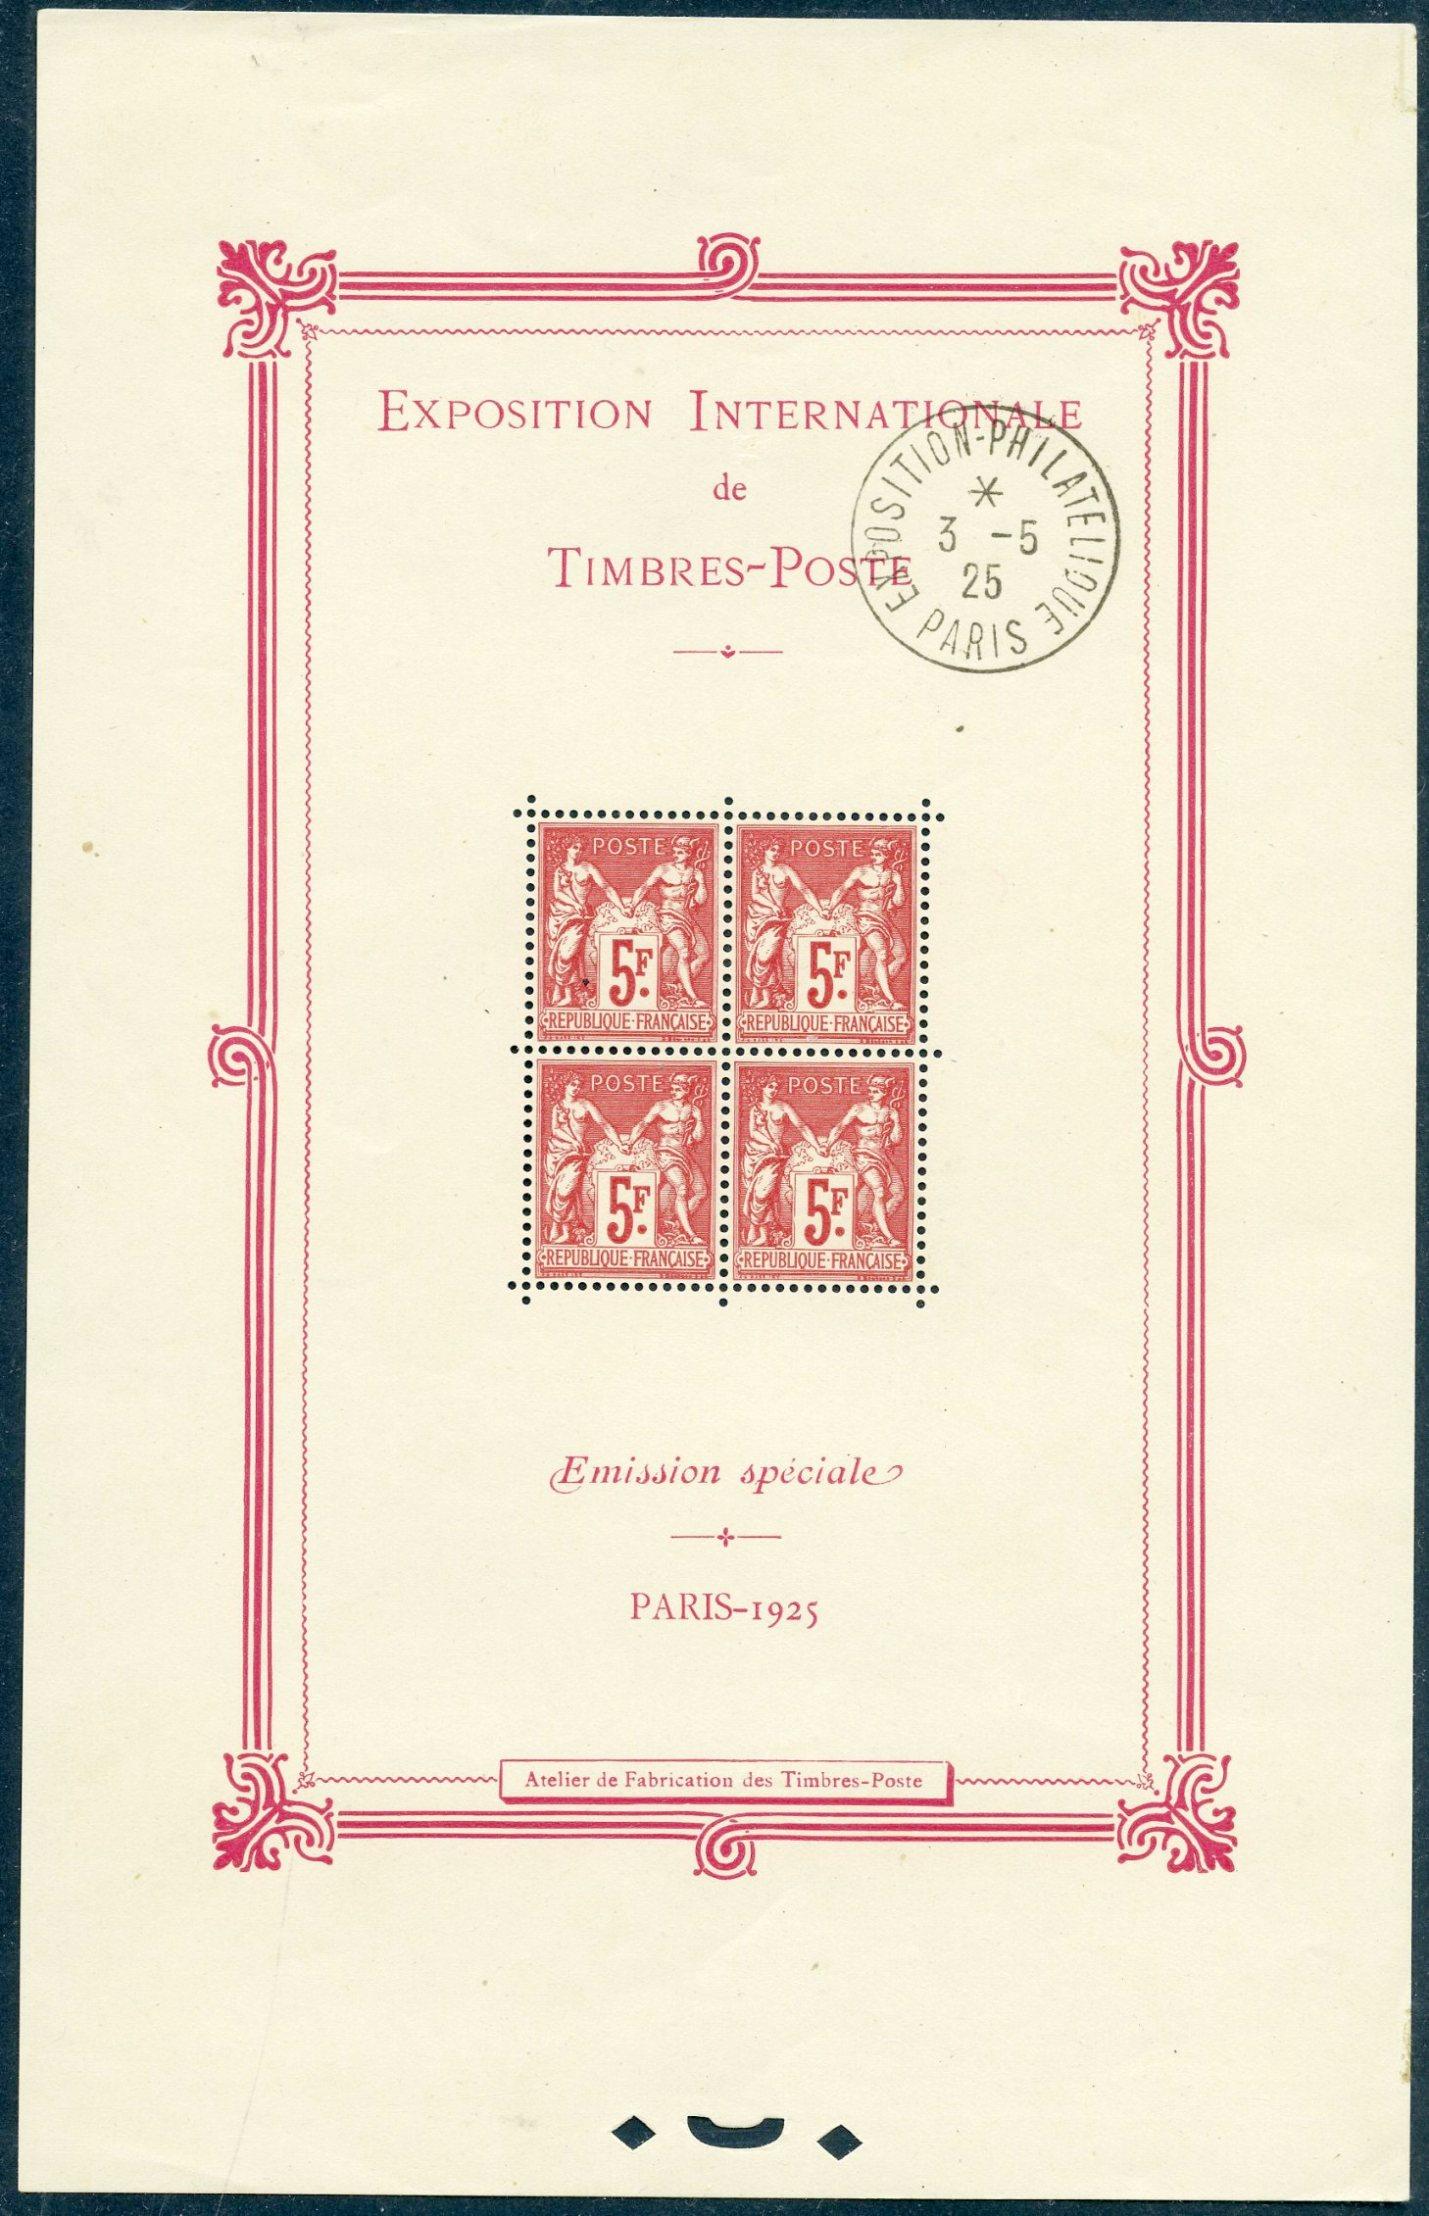 Lot 5 - FRANCE (See also #43/45)  -  Tel Aviv Stamps Ltd. Auction #49